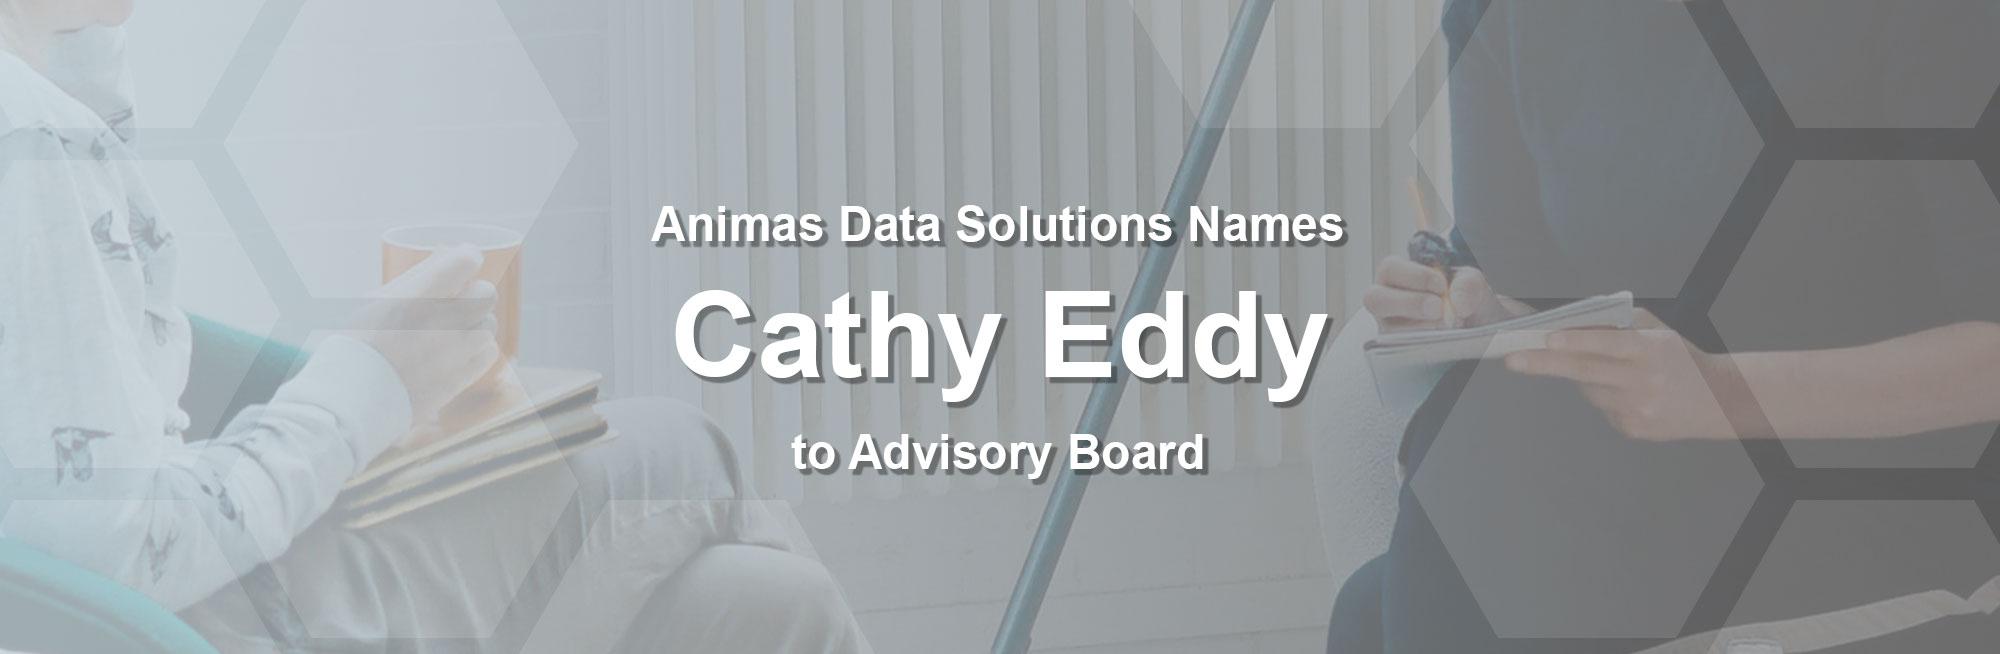 Animas Data Solutions Names Cathy Eddy to Advisory Board